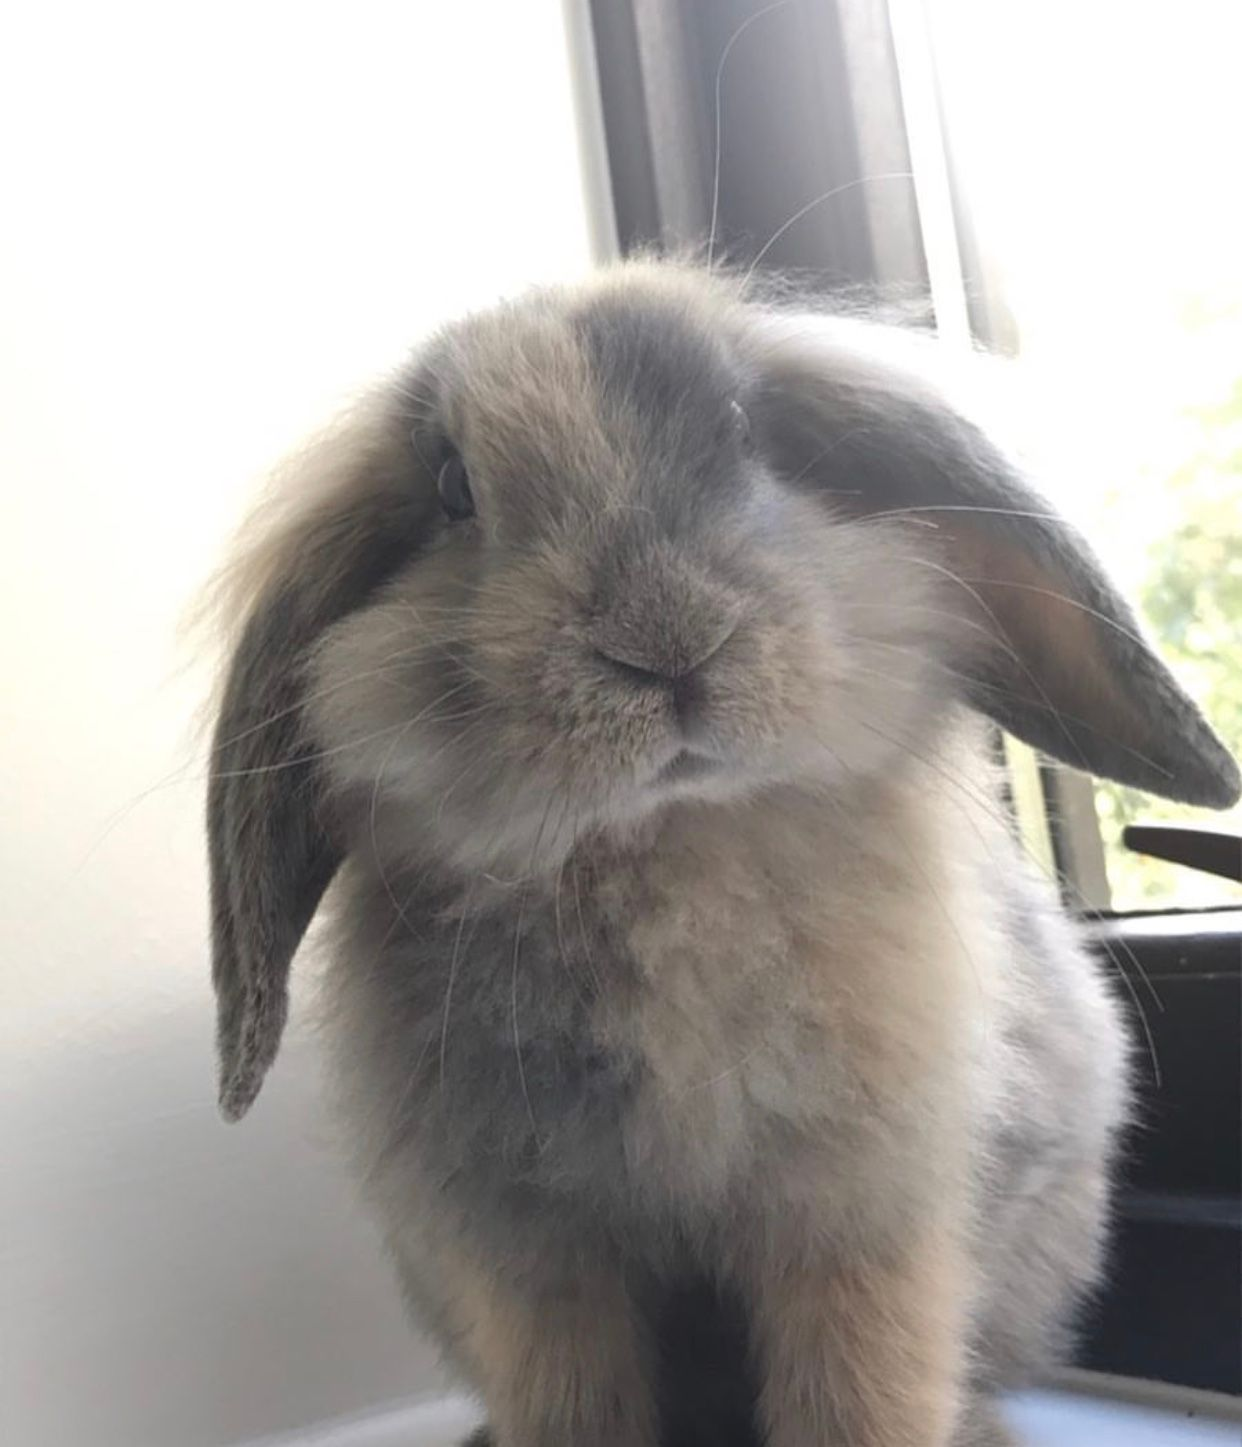 Image may contain: Rodent, Rabbit, Mammal, Bunny, Animal